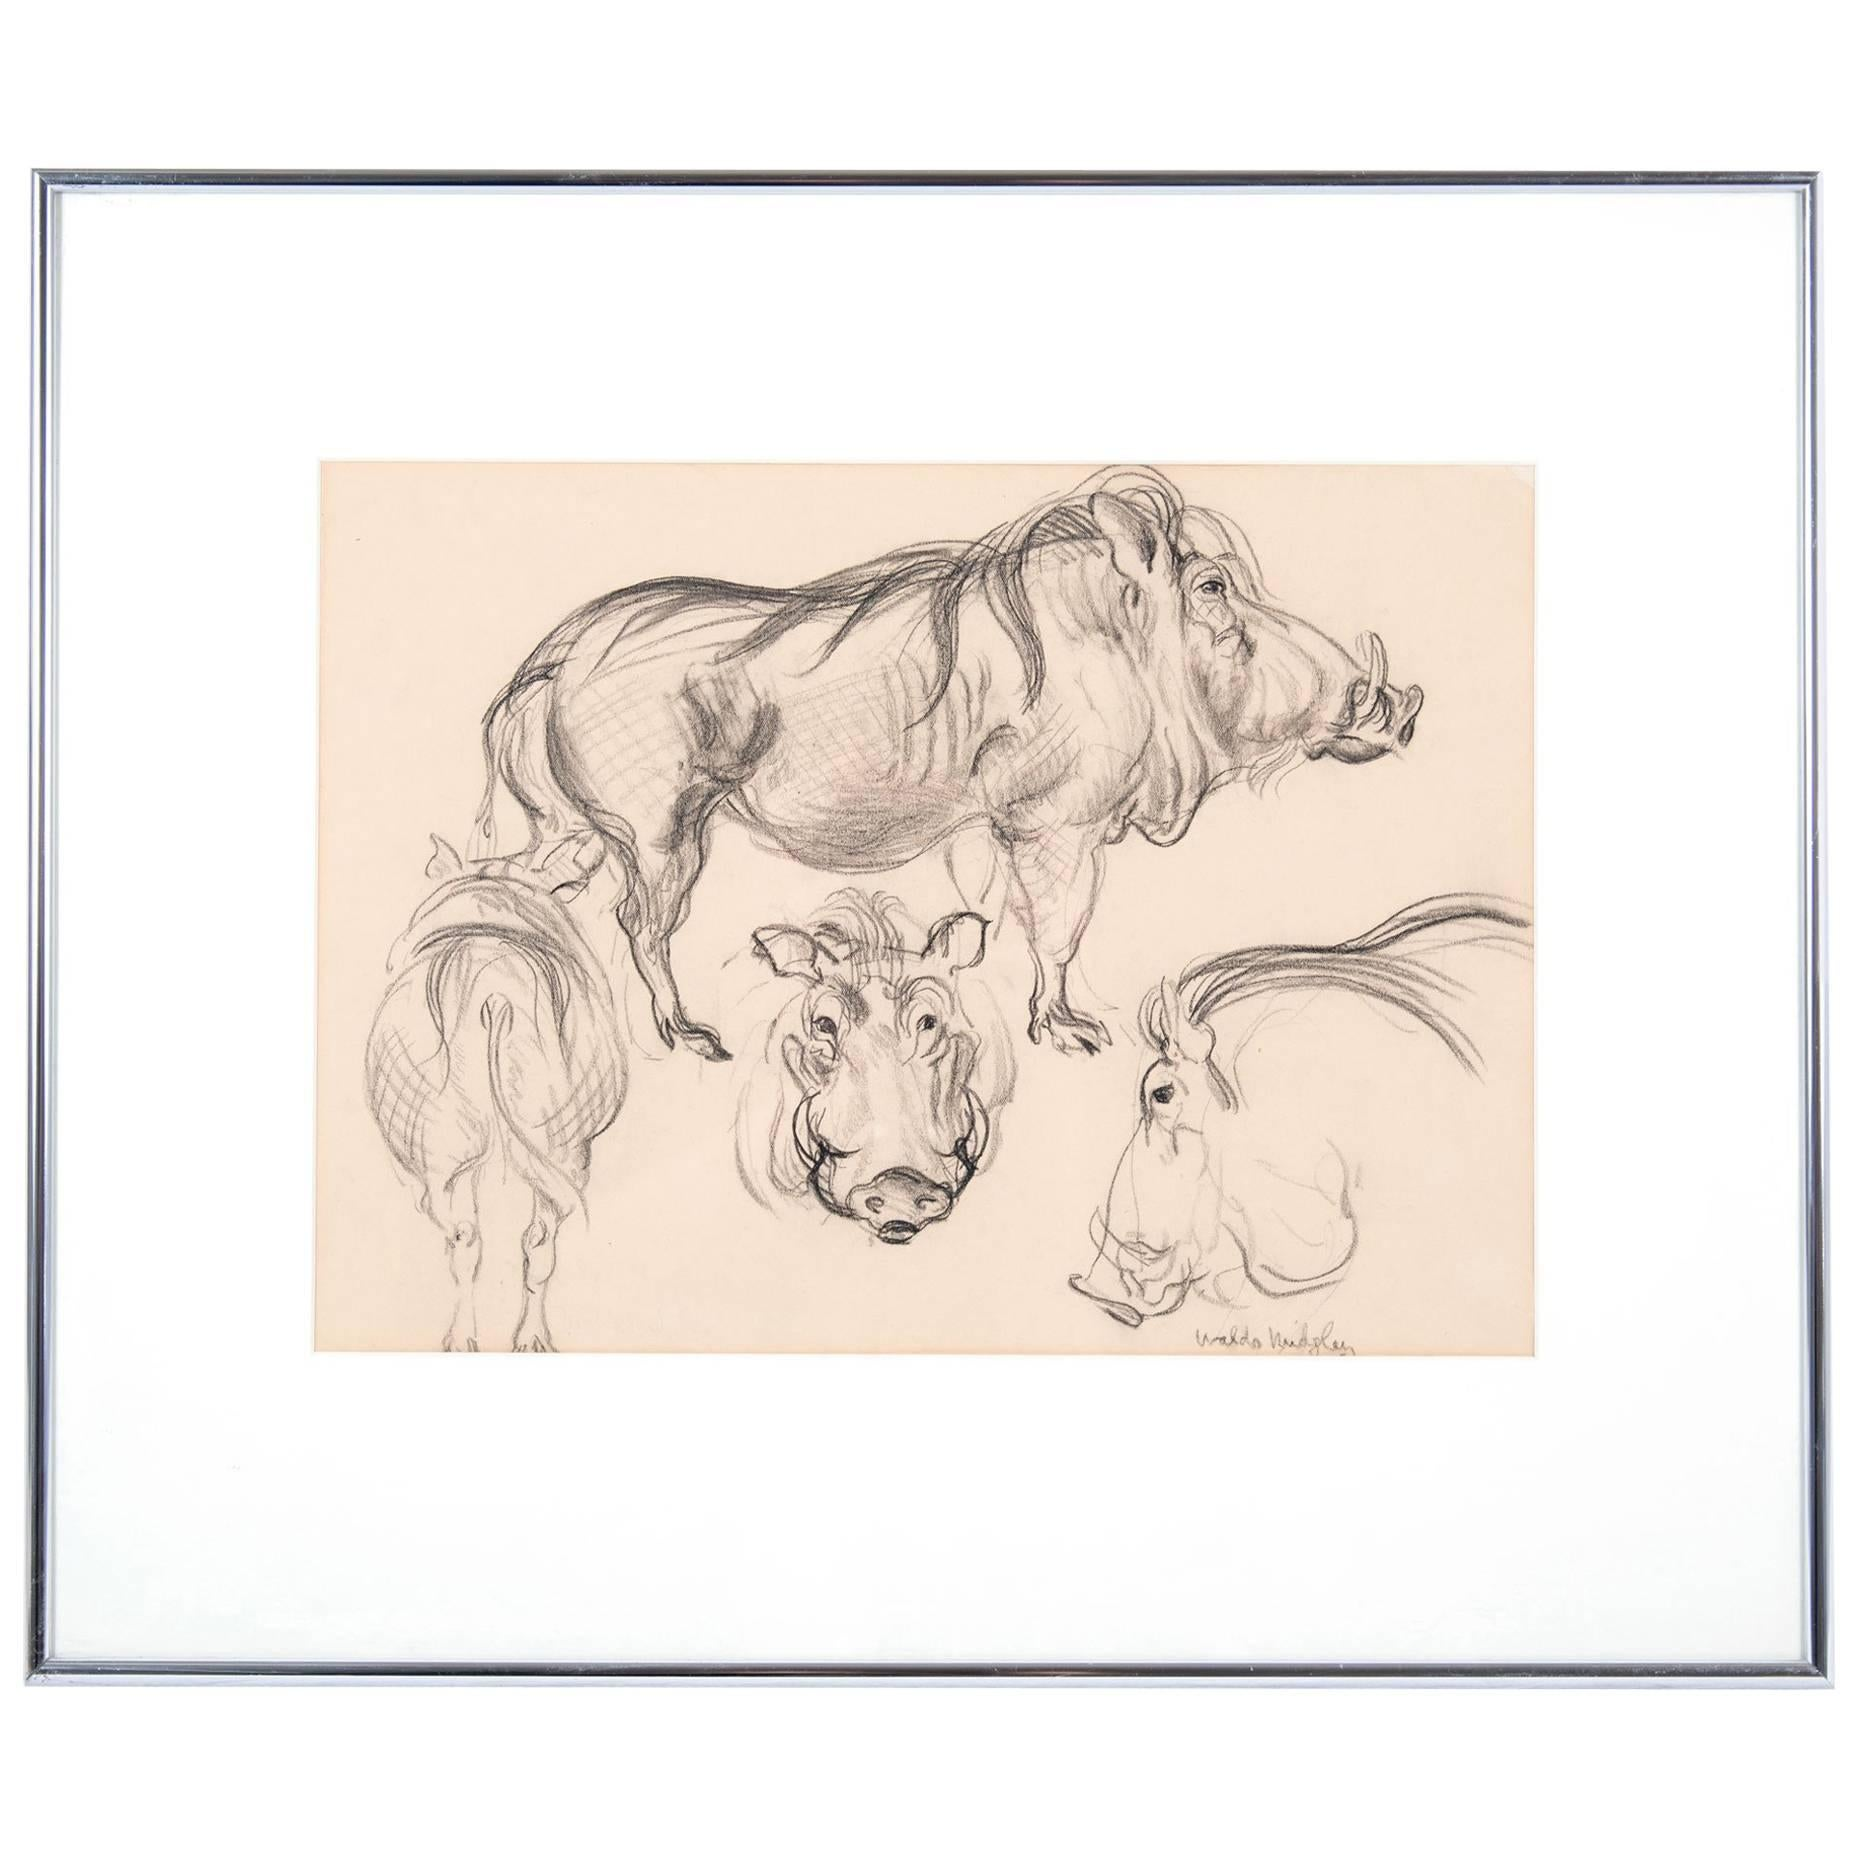 Boar Study by Waldo Midgley, 1993